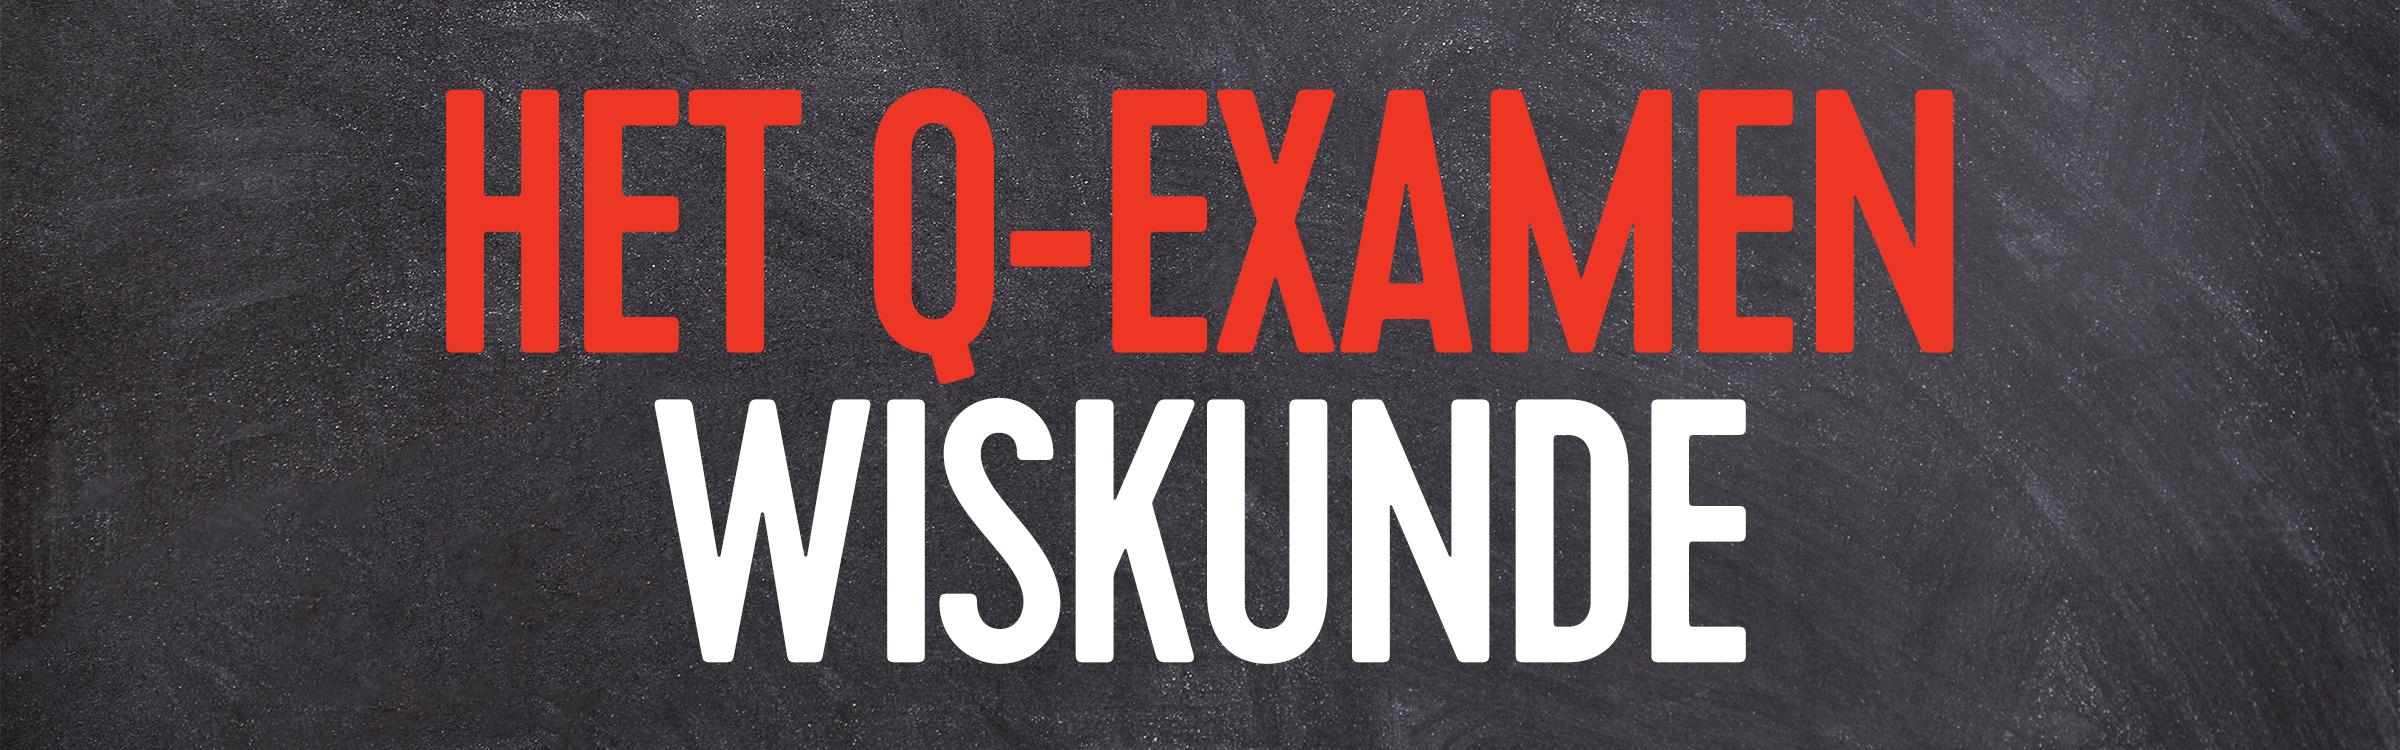 Q examen wiskunde header